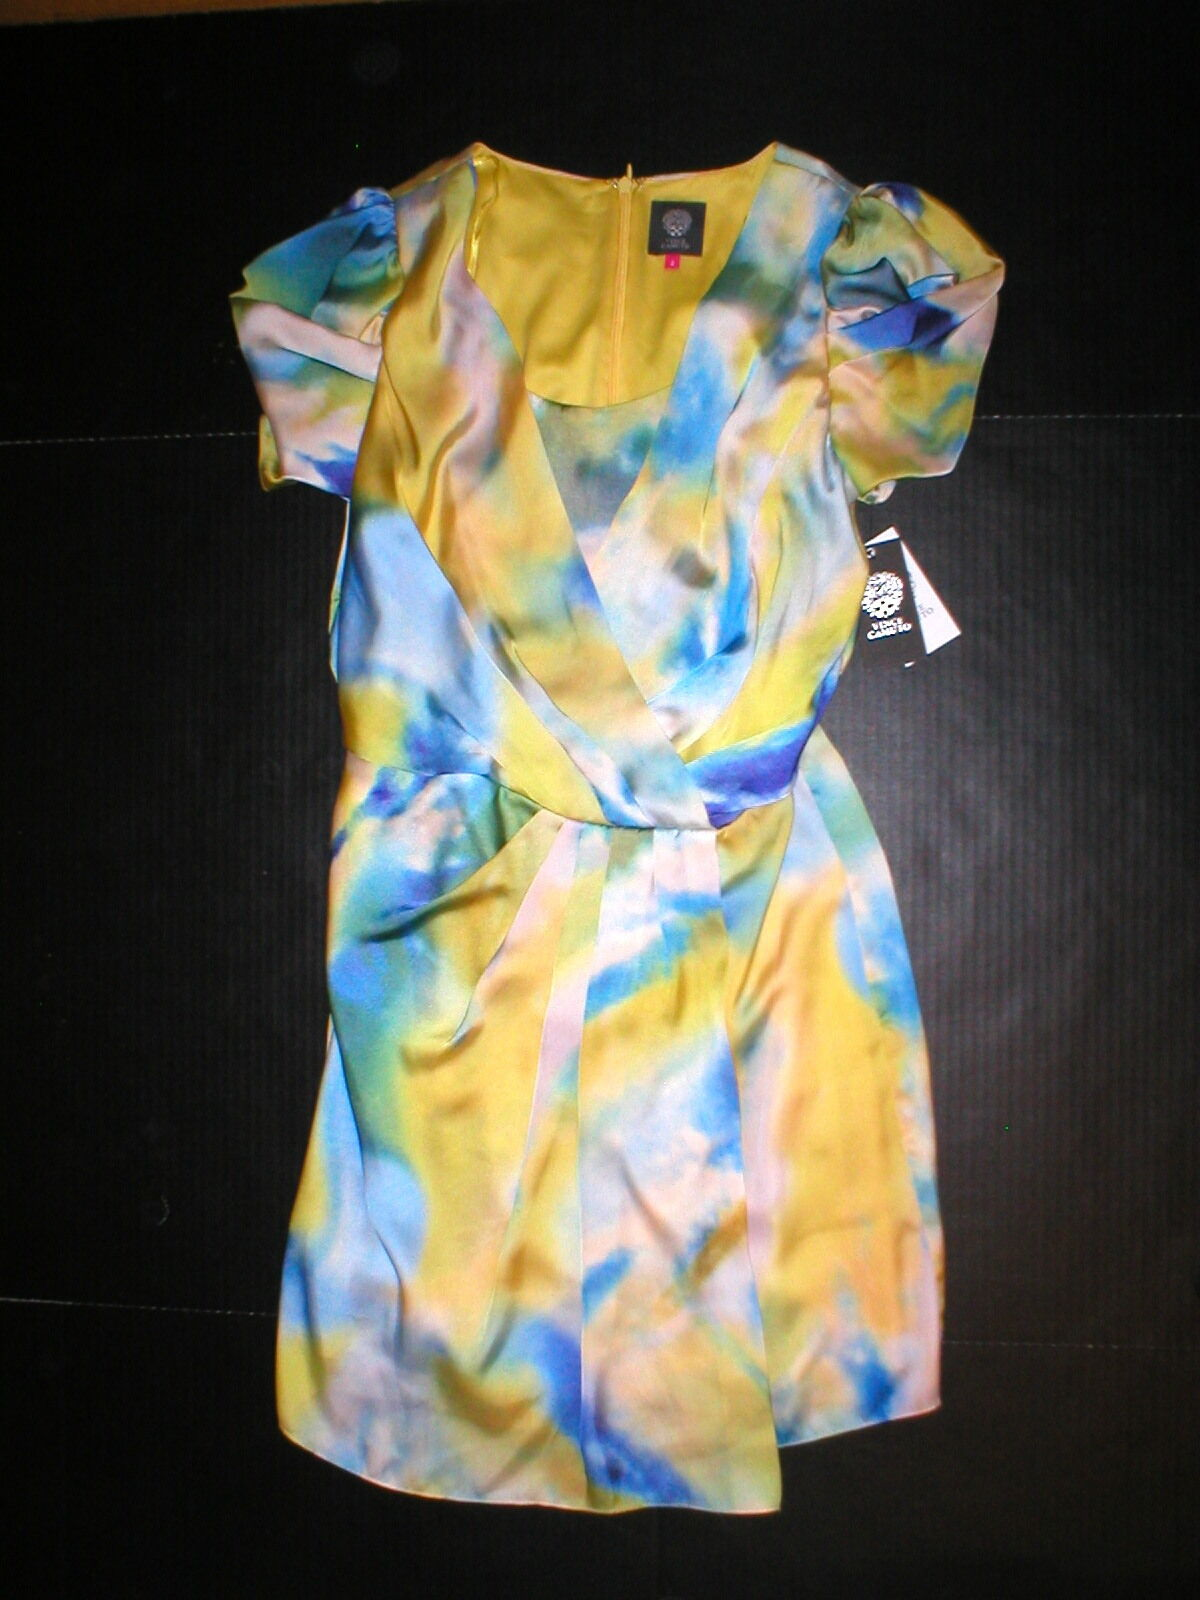 New damen 4 NWT  Vince Camuto Dress Blouson WaterFarbe Blau Gelb Weiß